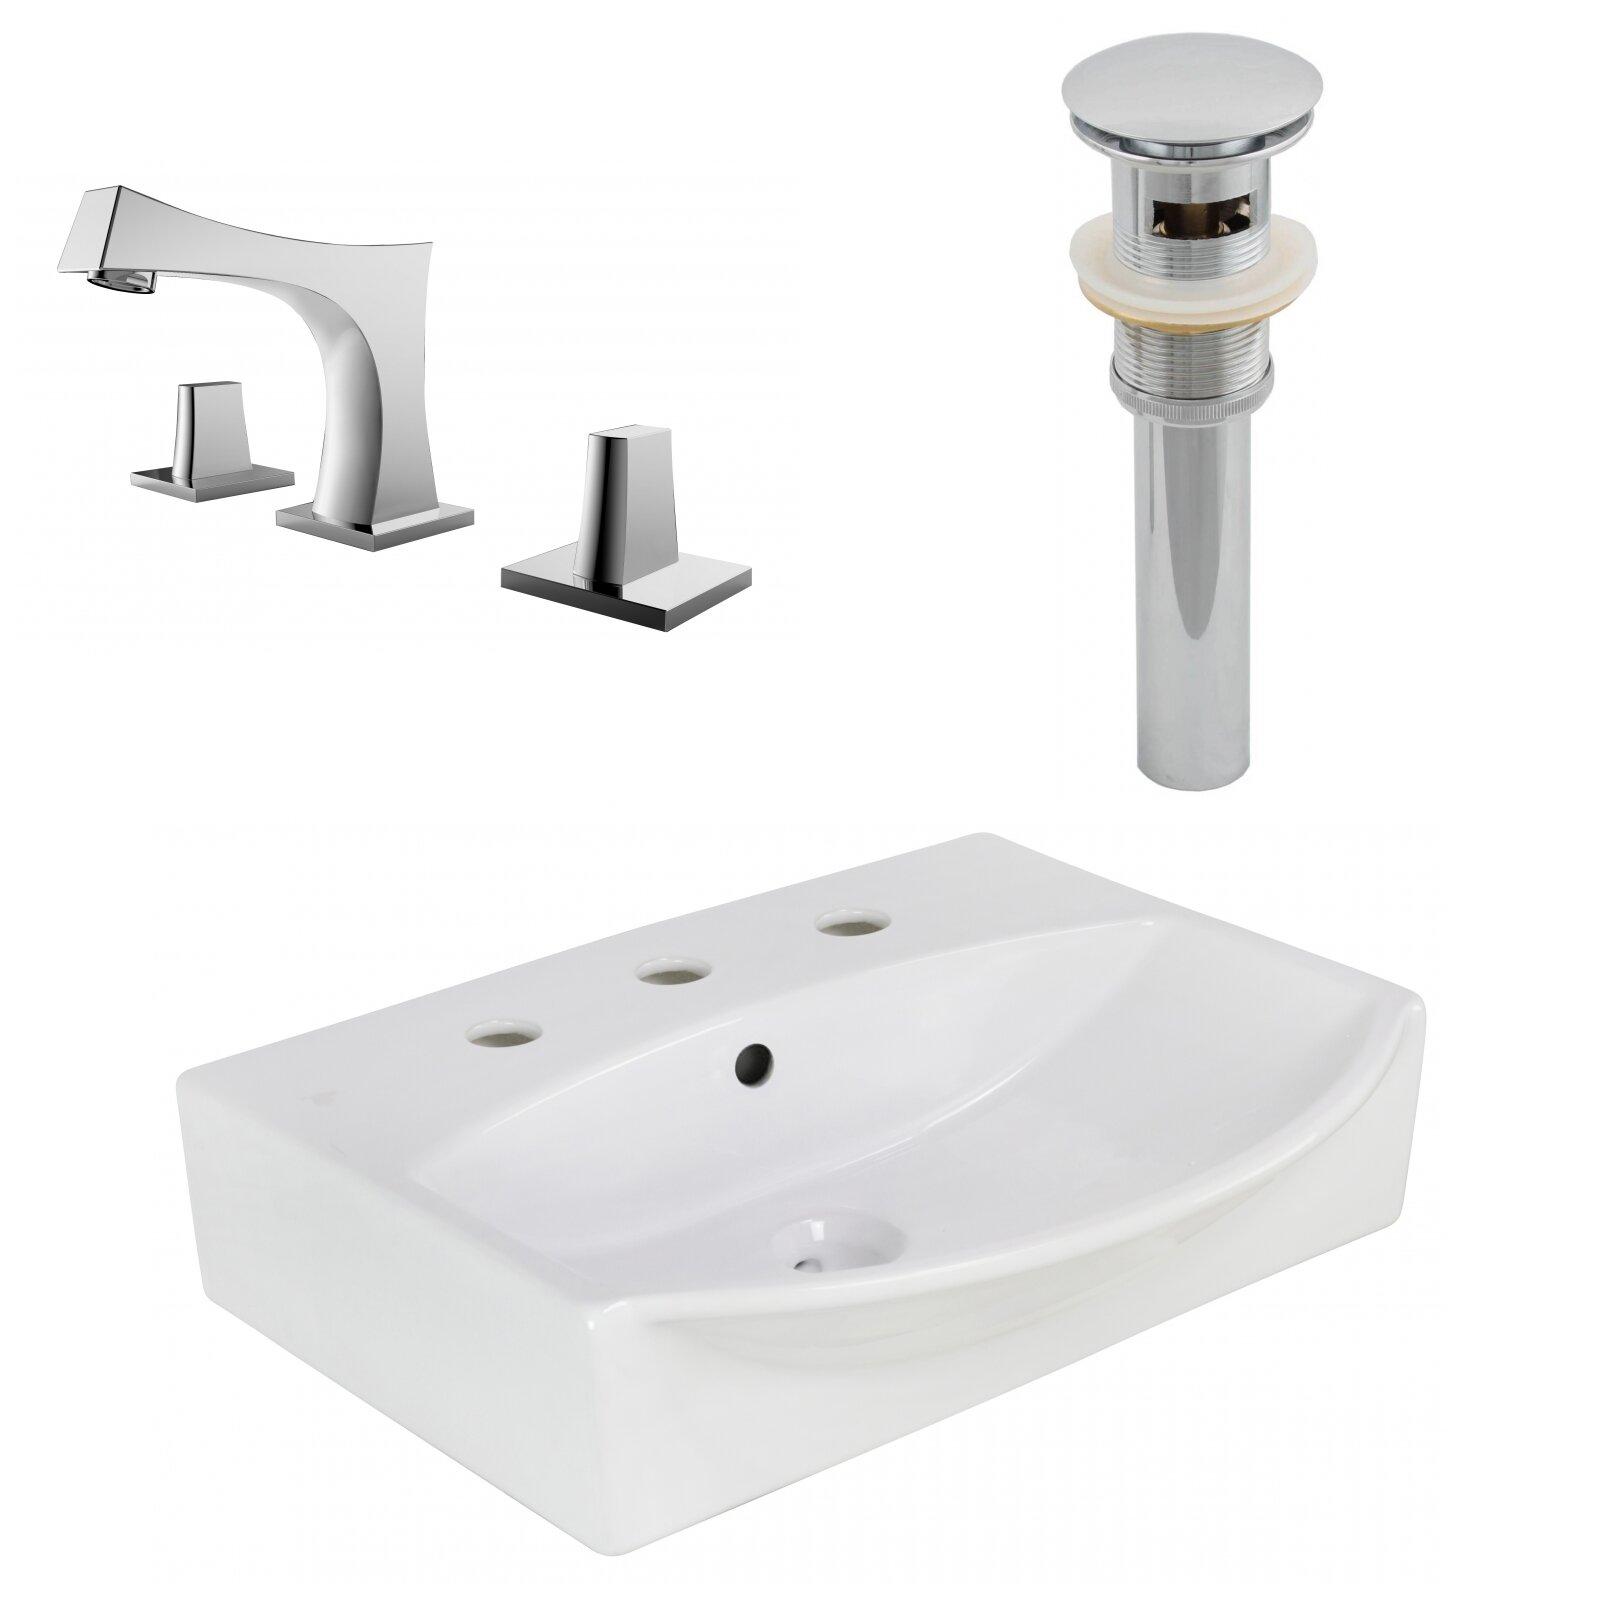 Avanities Above Counter Ceramic Specialty Vessel Bathroom Sink With Faucet And Overflow Wayfair